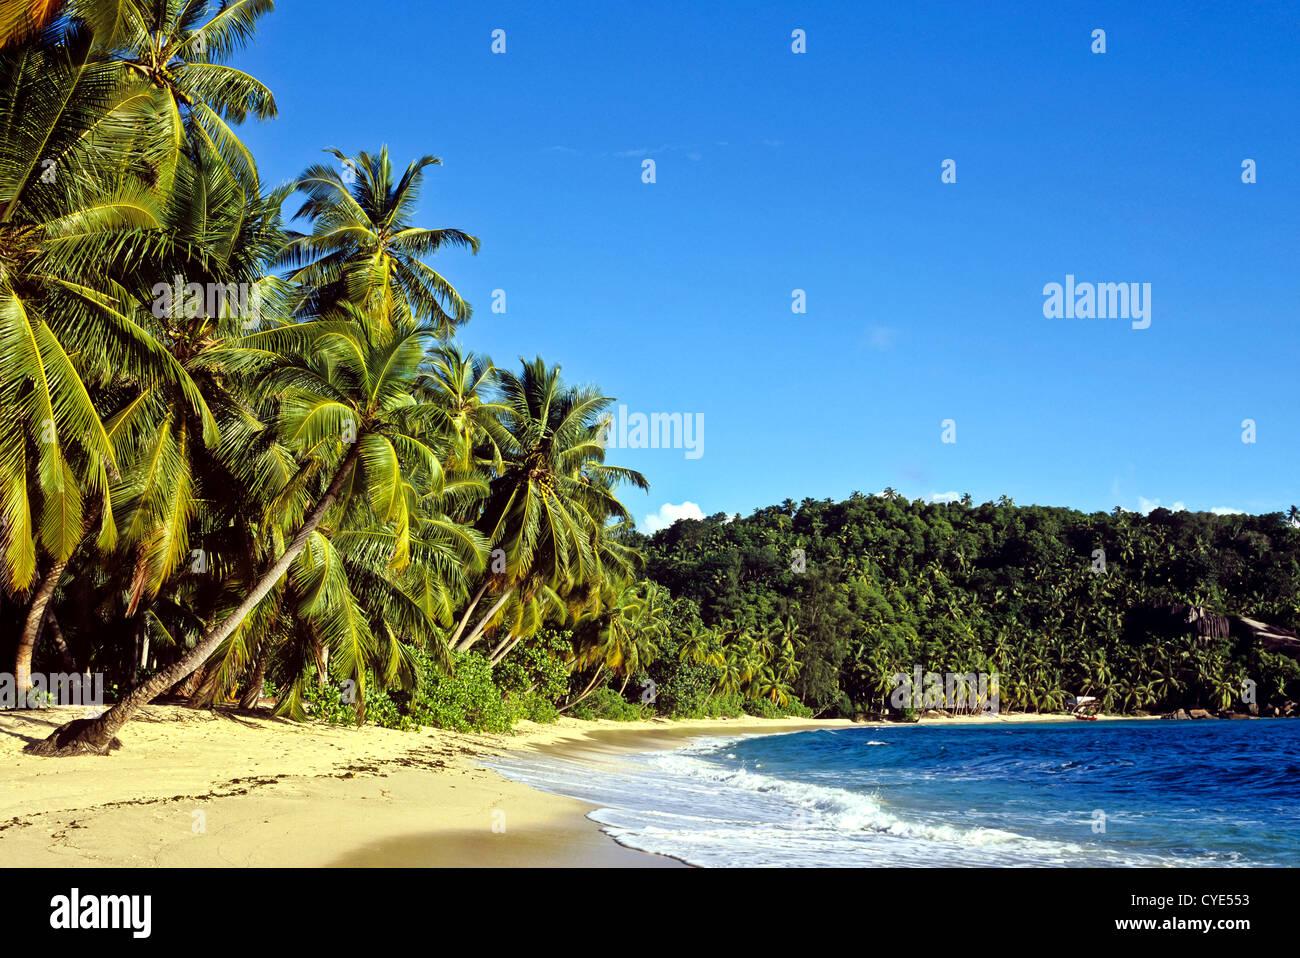 8288. Anse Takamaka, Mahe, Seychelles - Stock Image